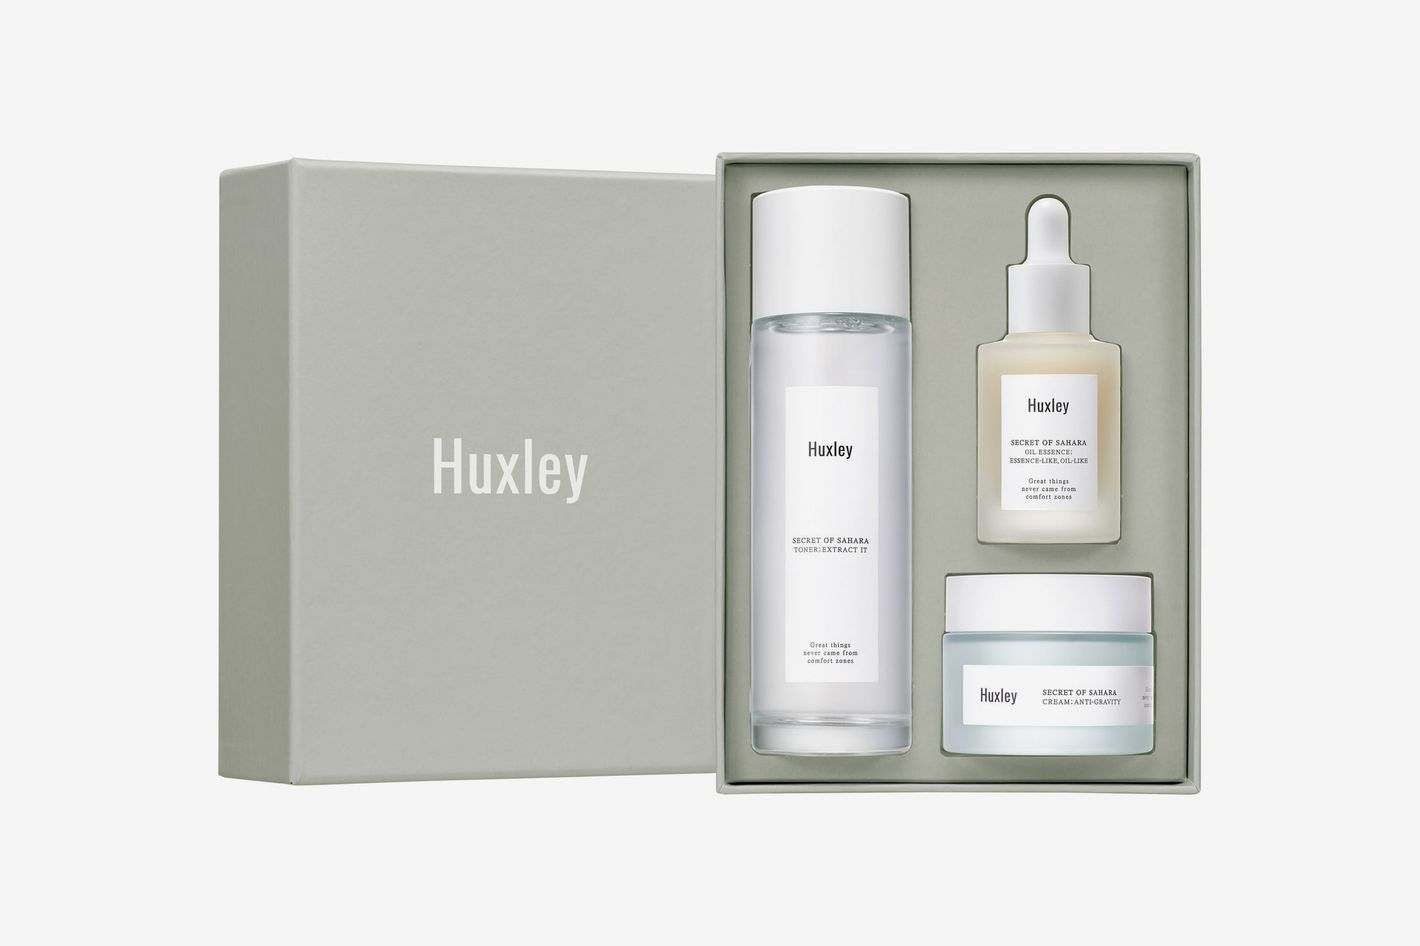 Huxley Antioxidant Trio